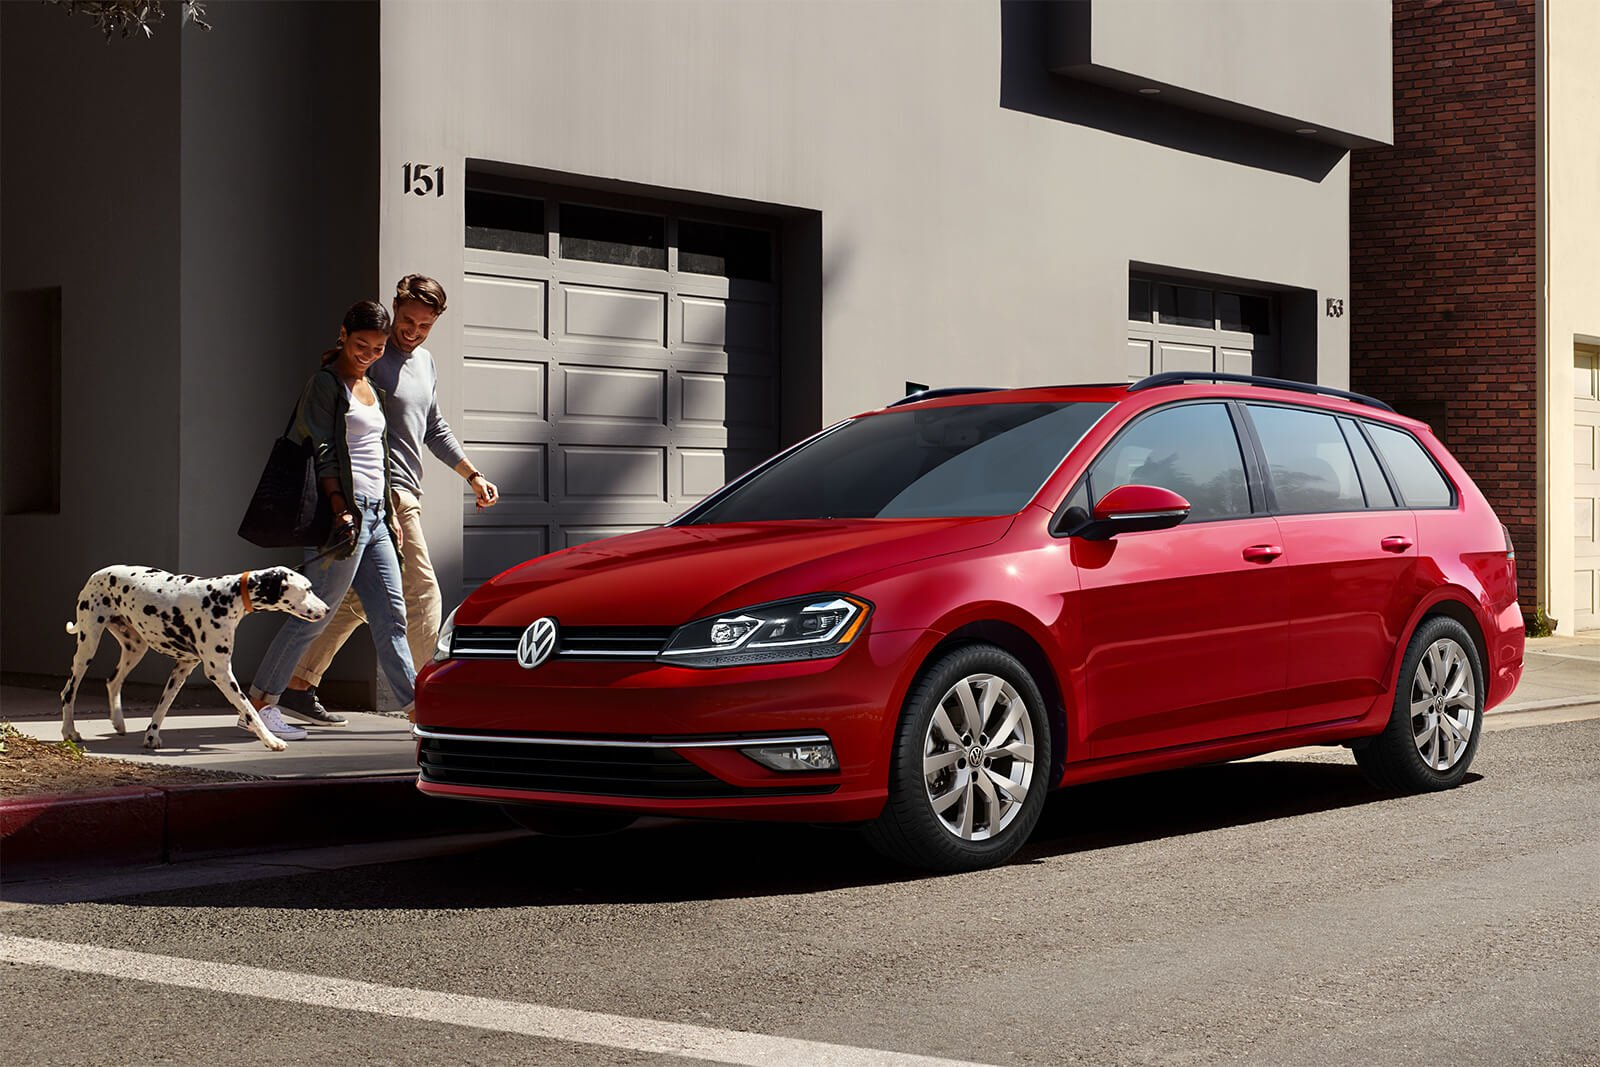 Vw Lease Specials >> New Vw Golf Sportwagen Lease Deals Finance Offers